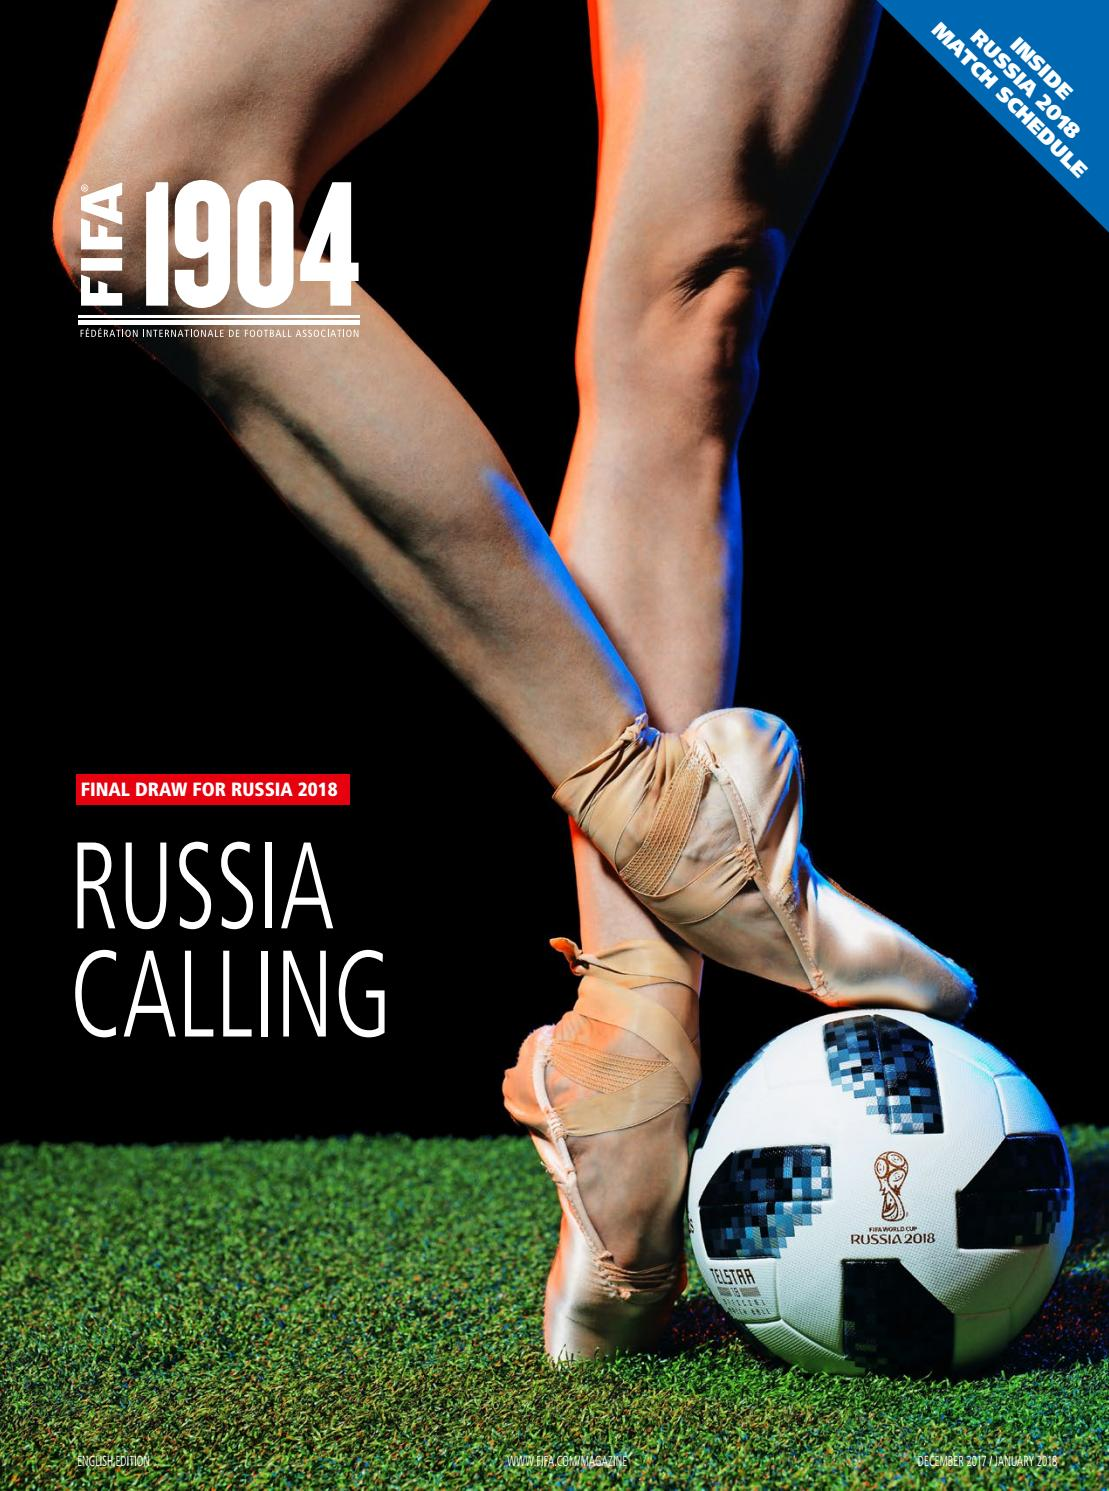 FIFA World Cup 2018 Russia/™ Scarf Panama